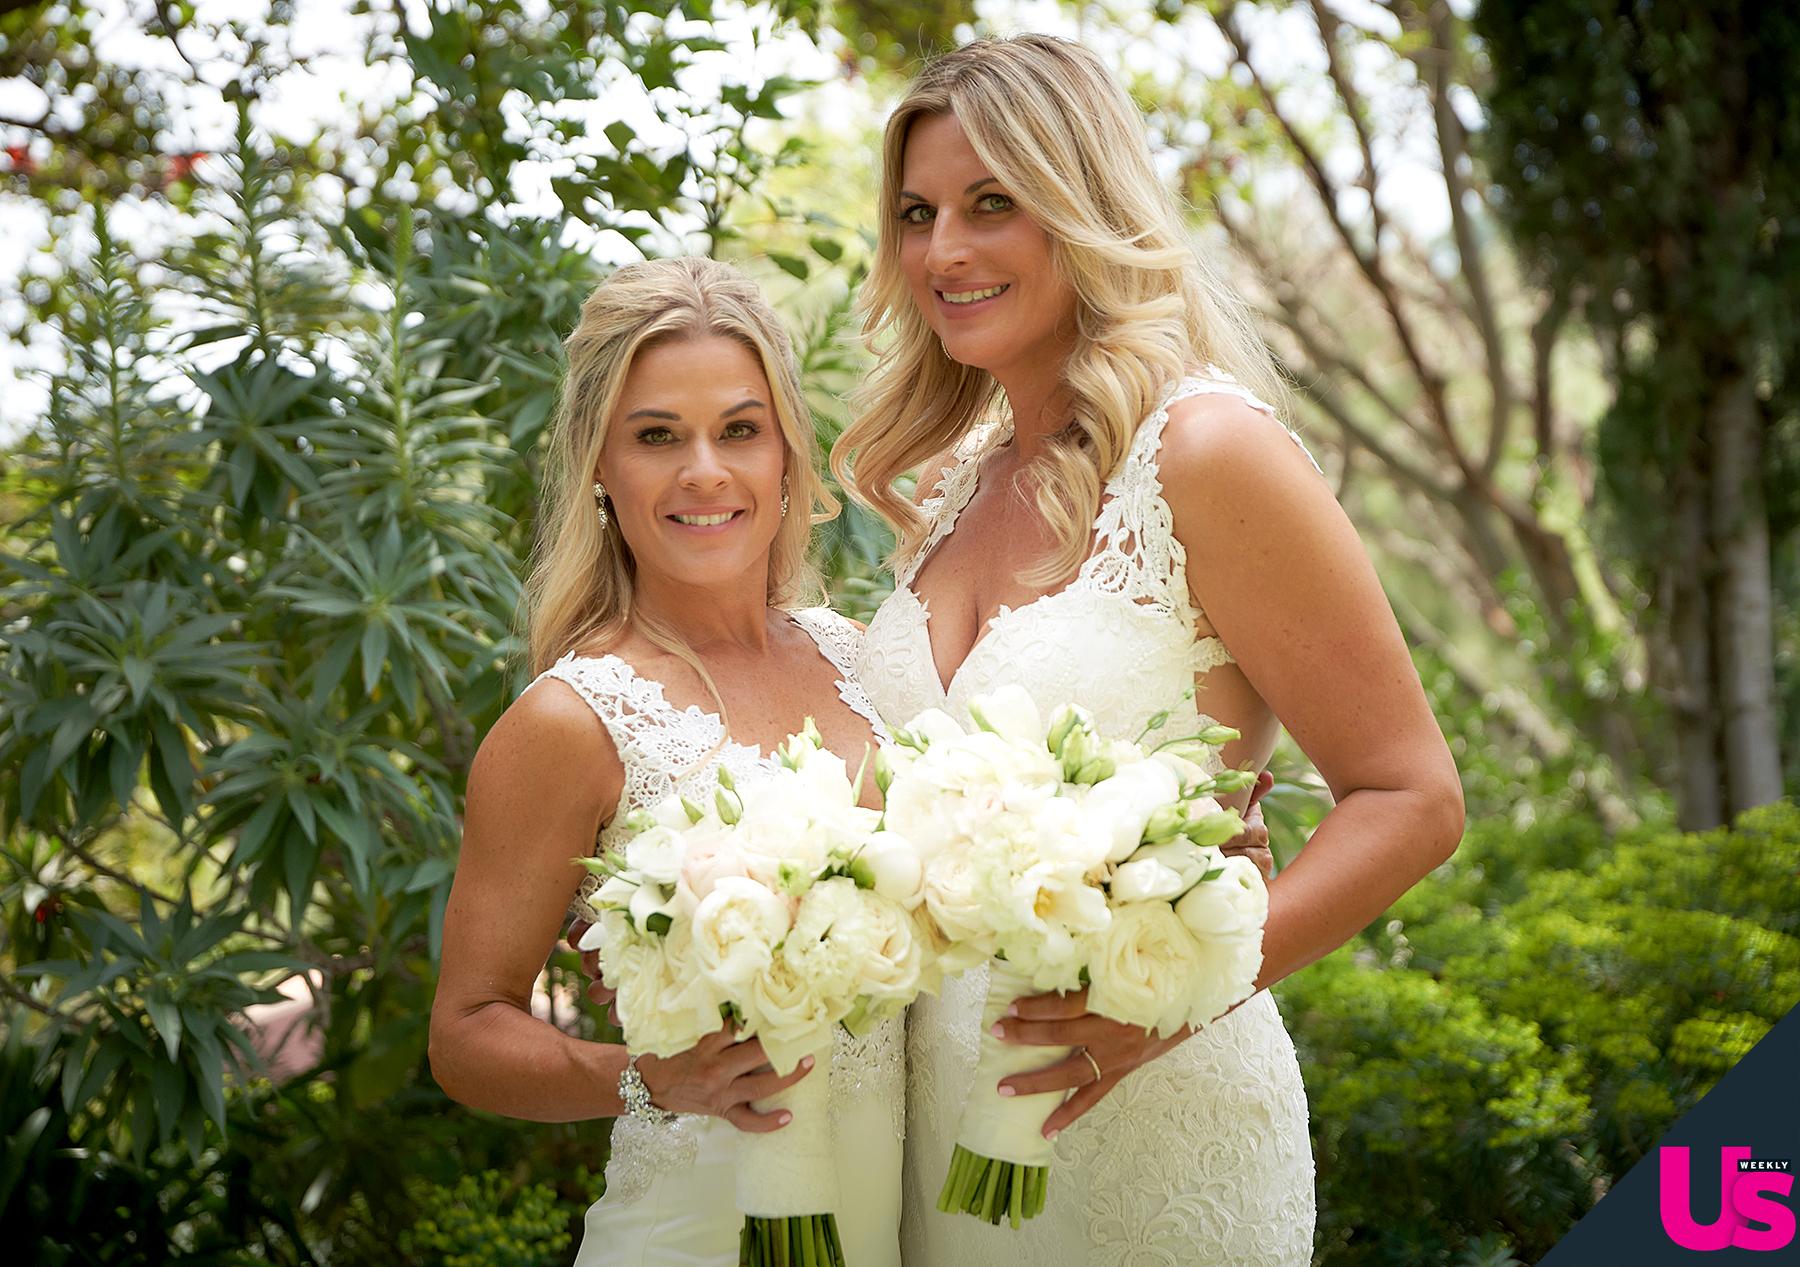 cat cora and nicole ehrlichs perfect wedding day on zig